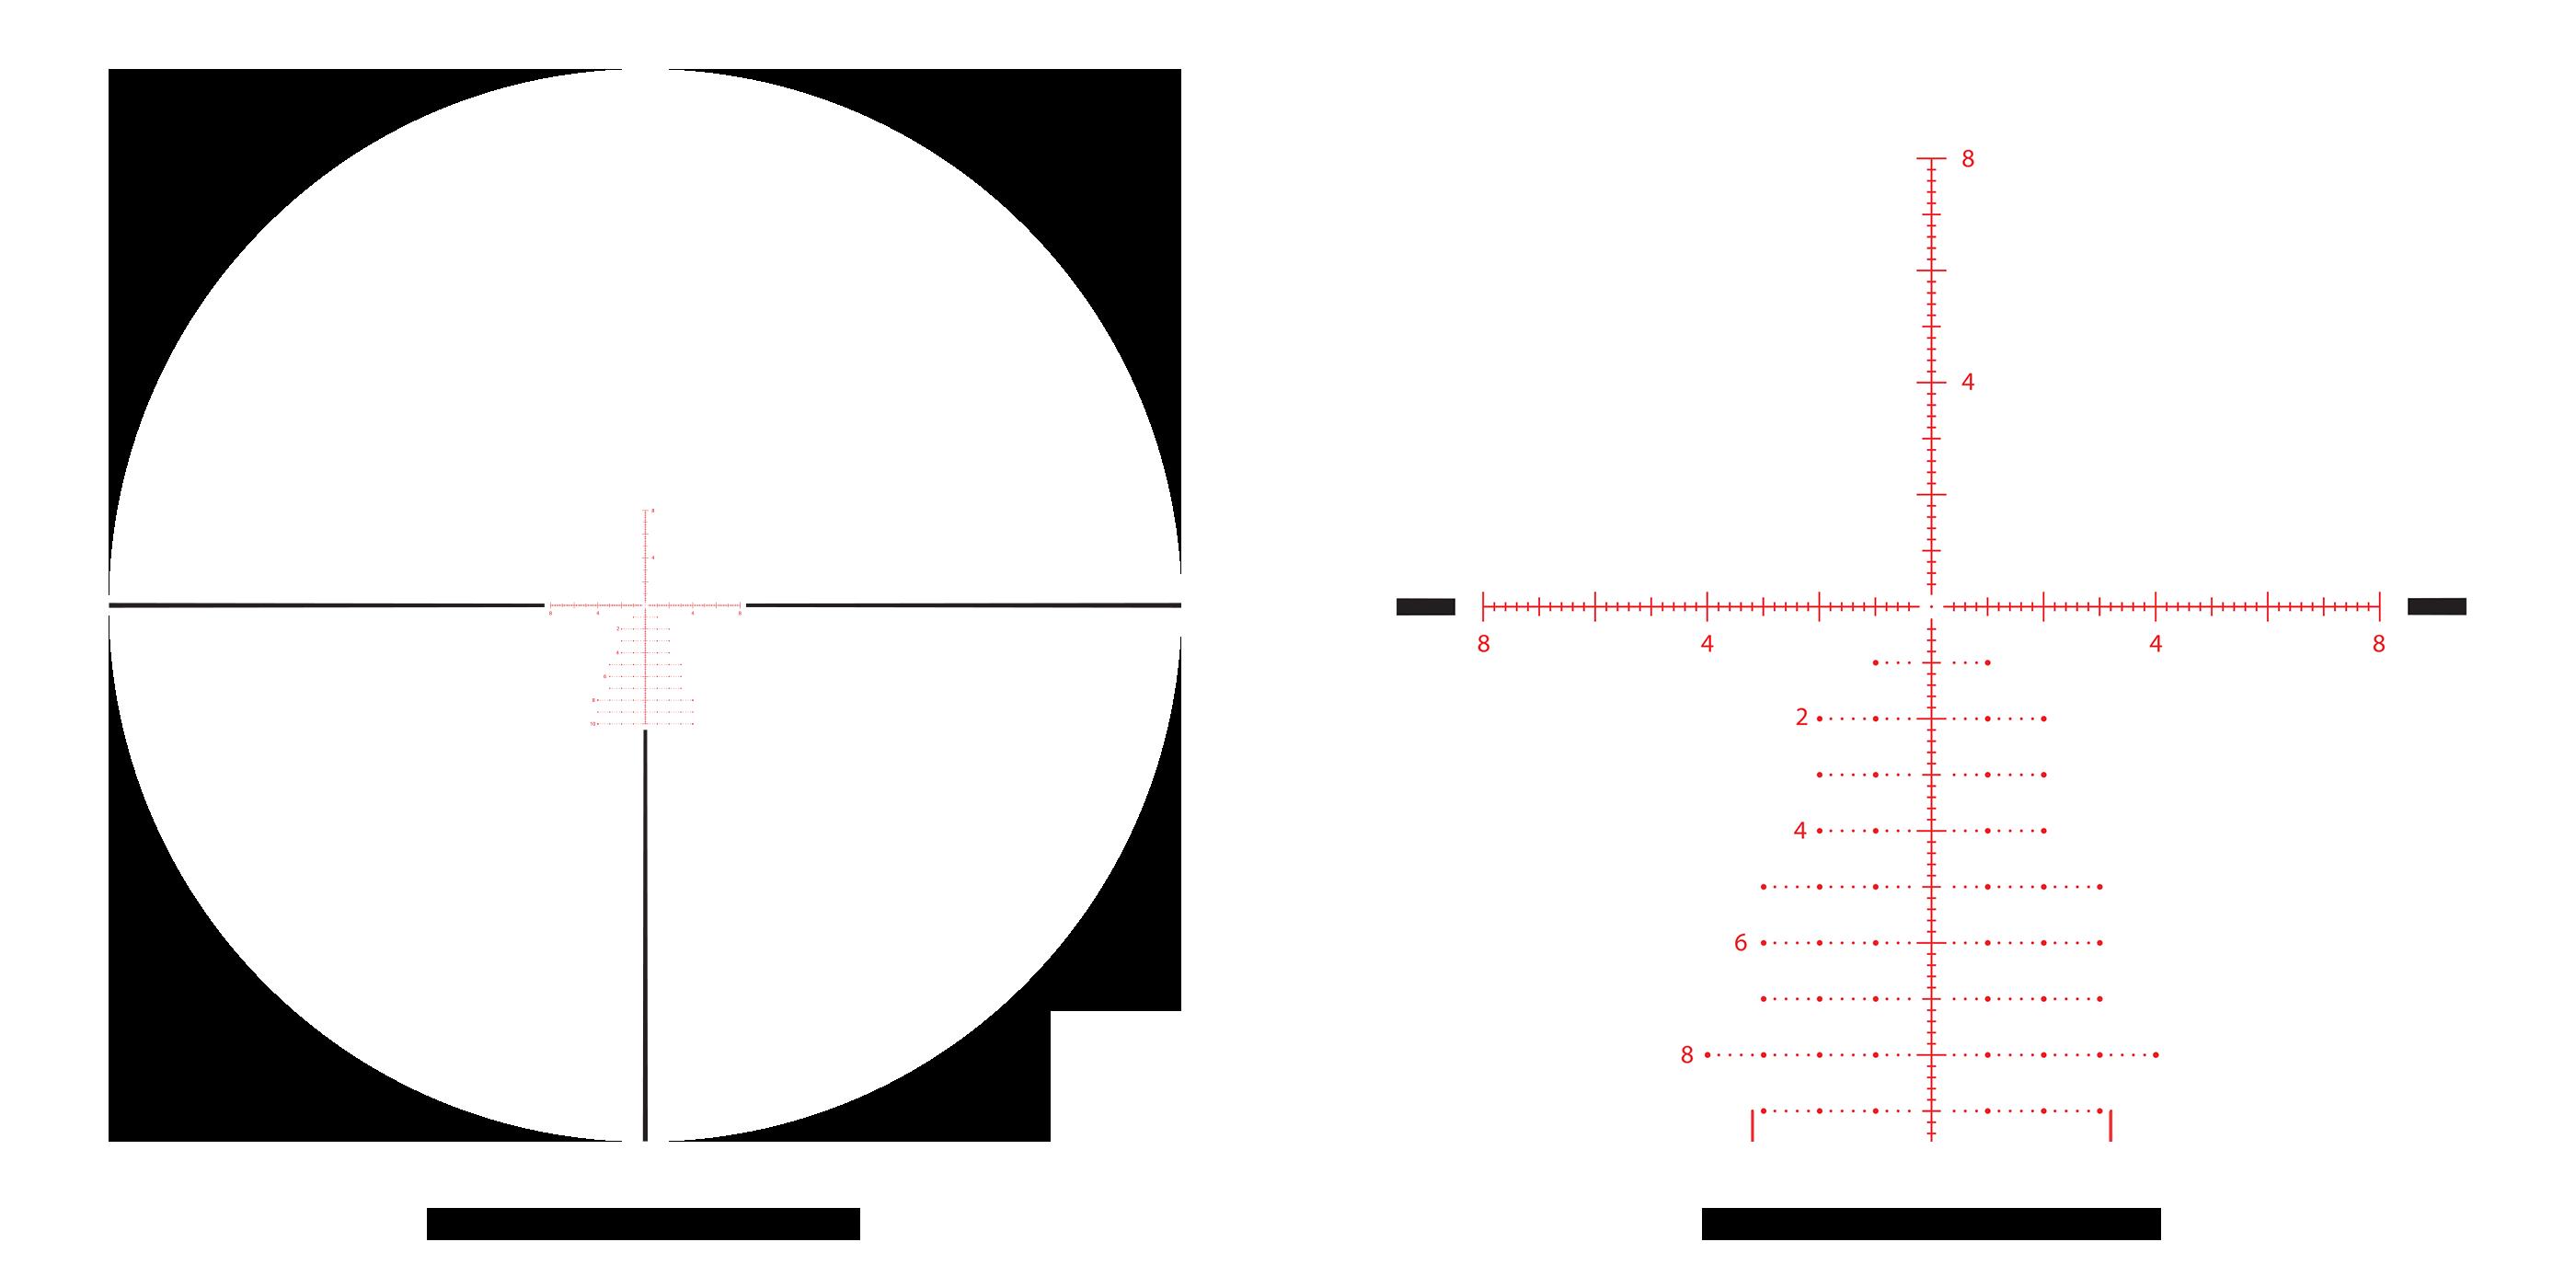 APRS6 4-20x reticle